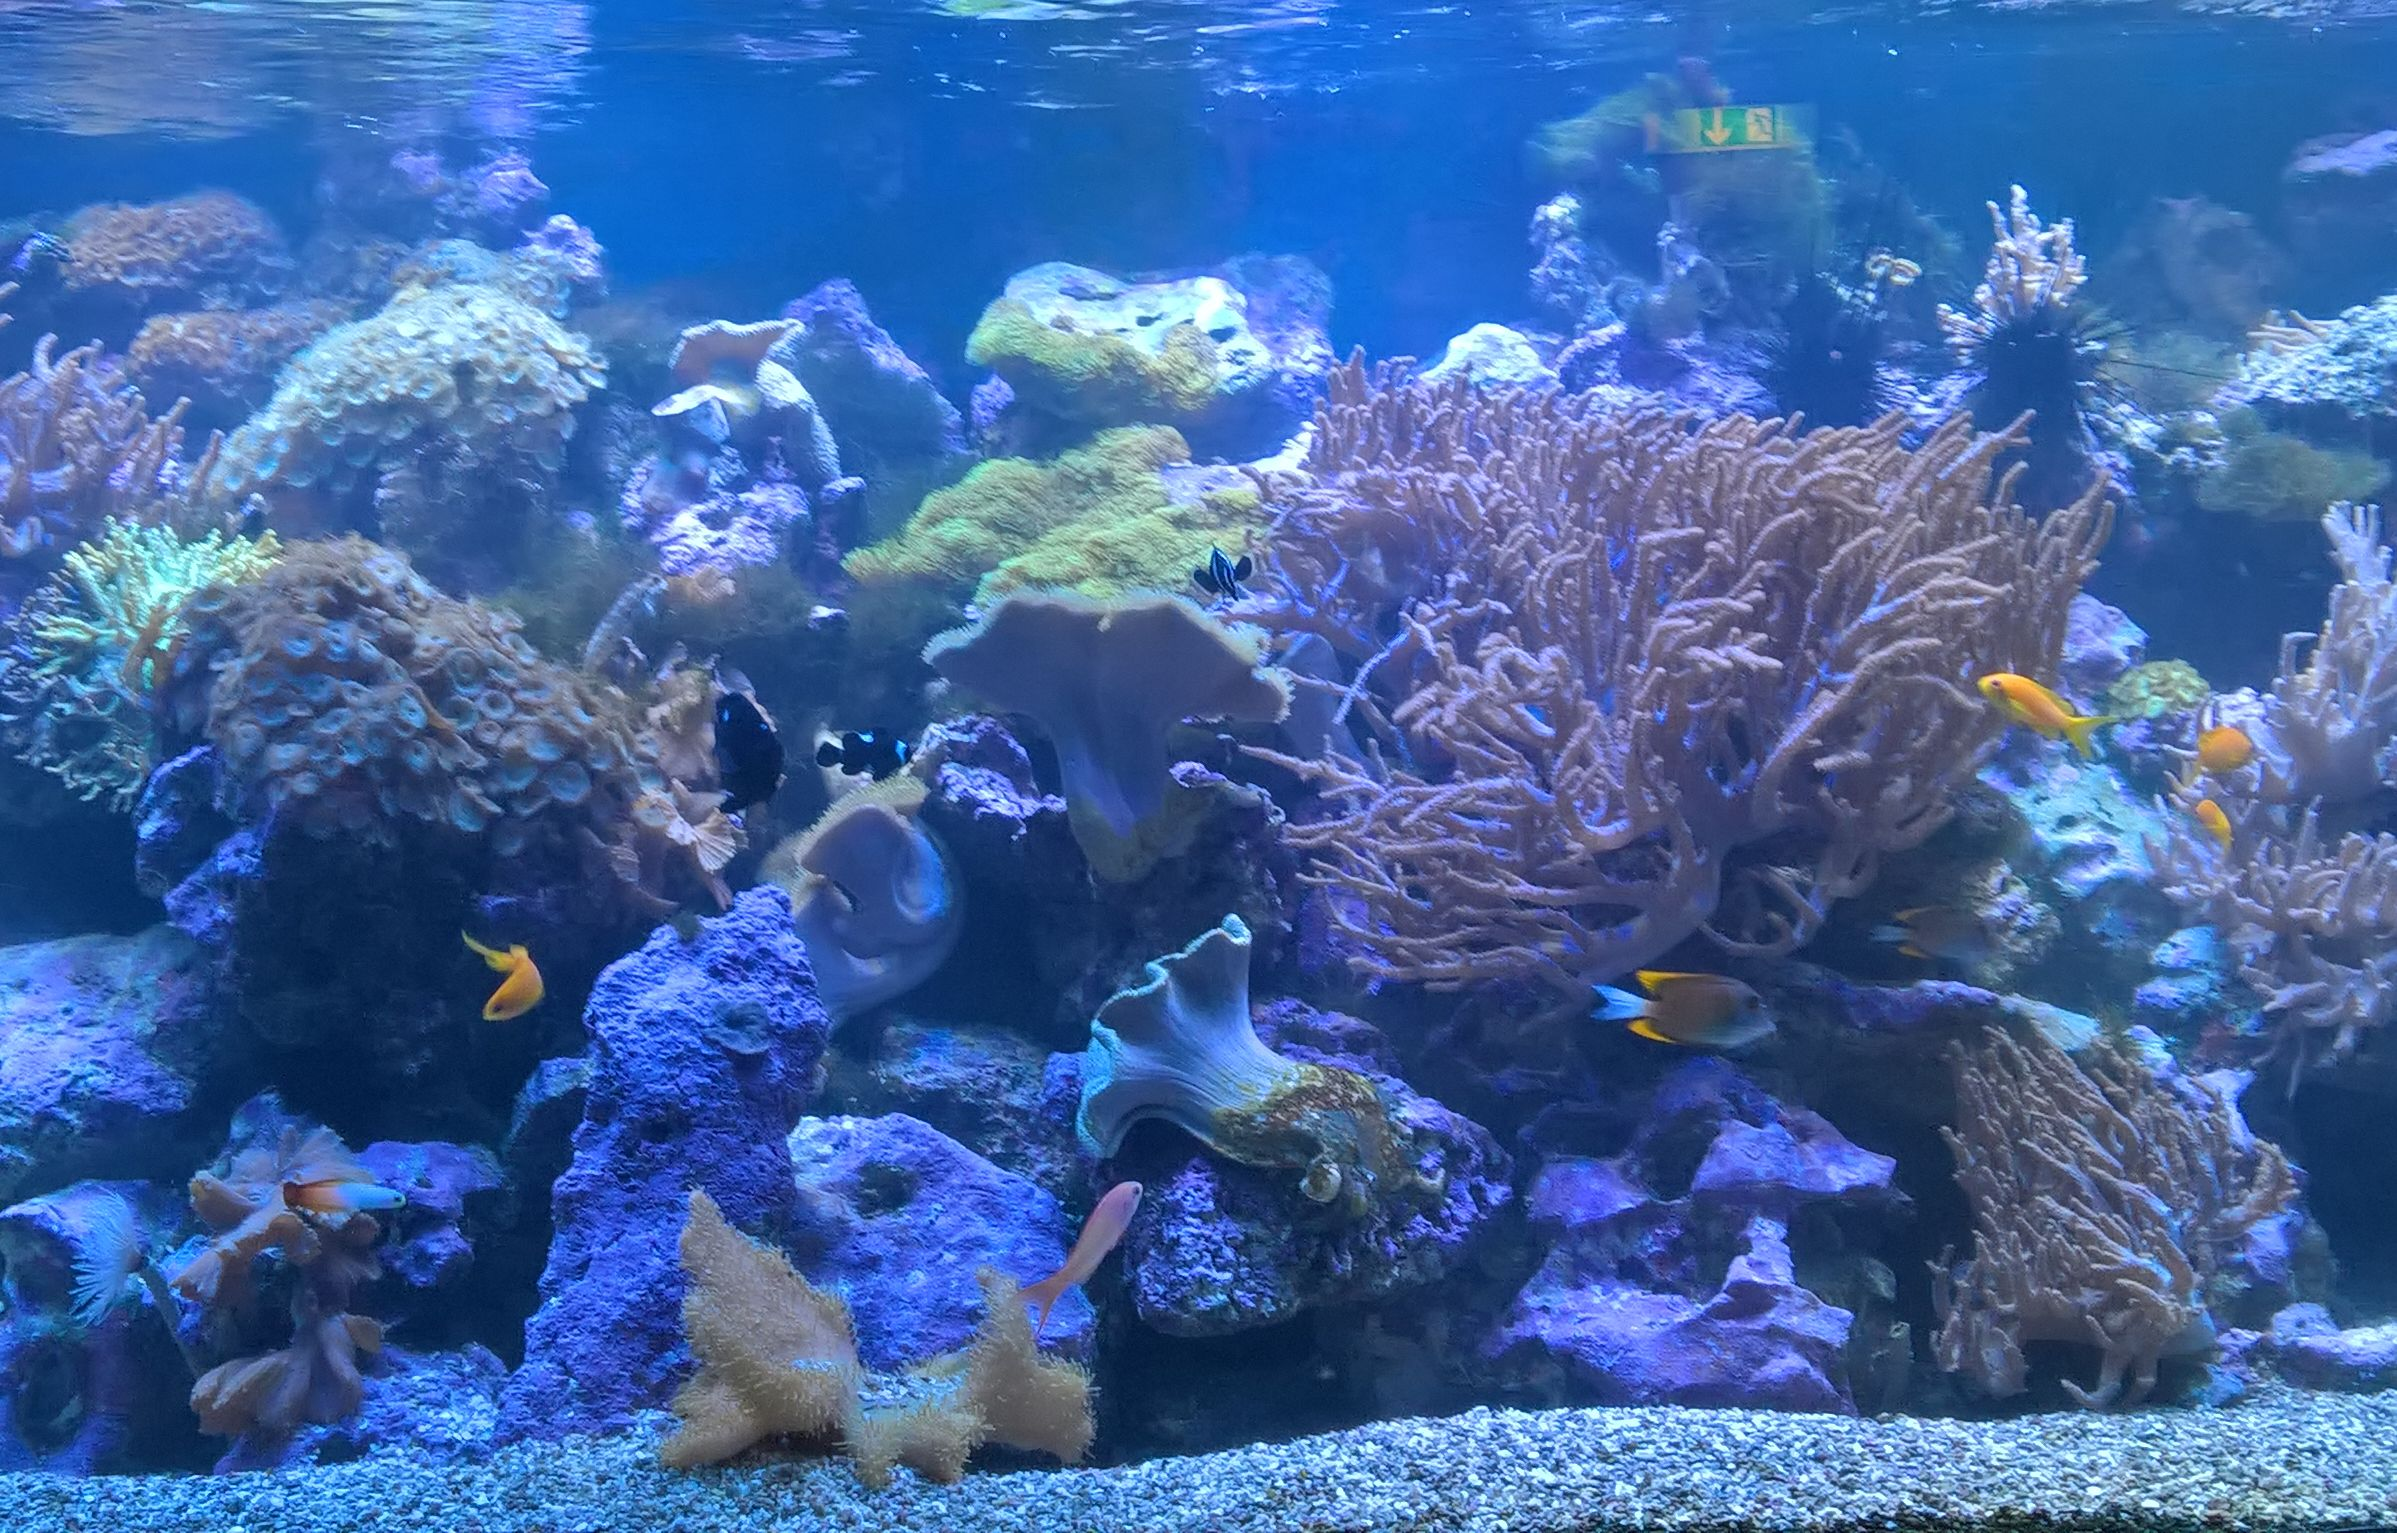 Betreuung eines Aquariums im Hospiz St. Elisabeth